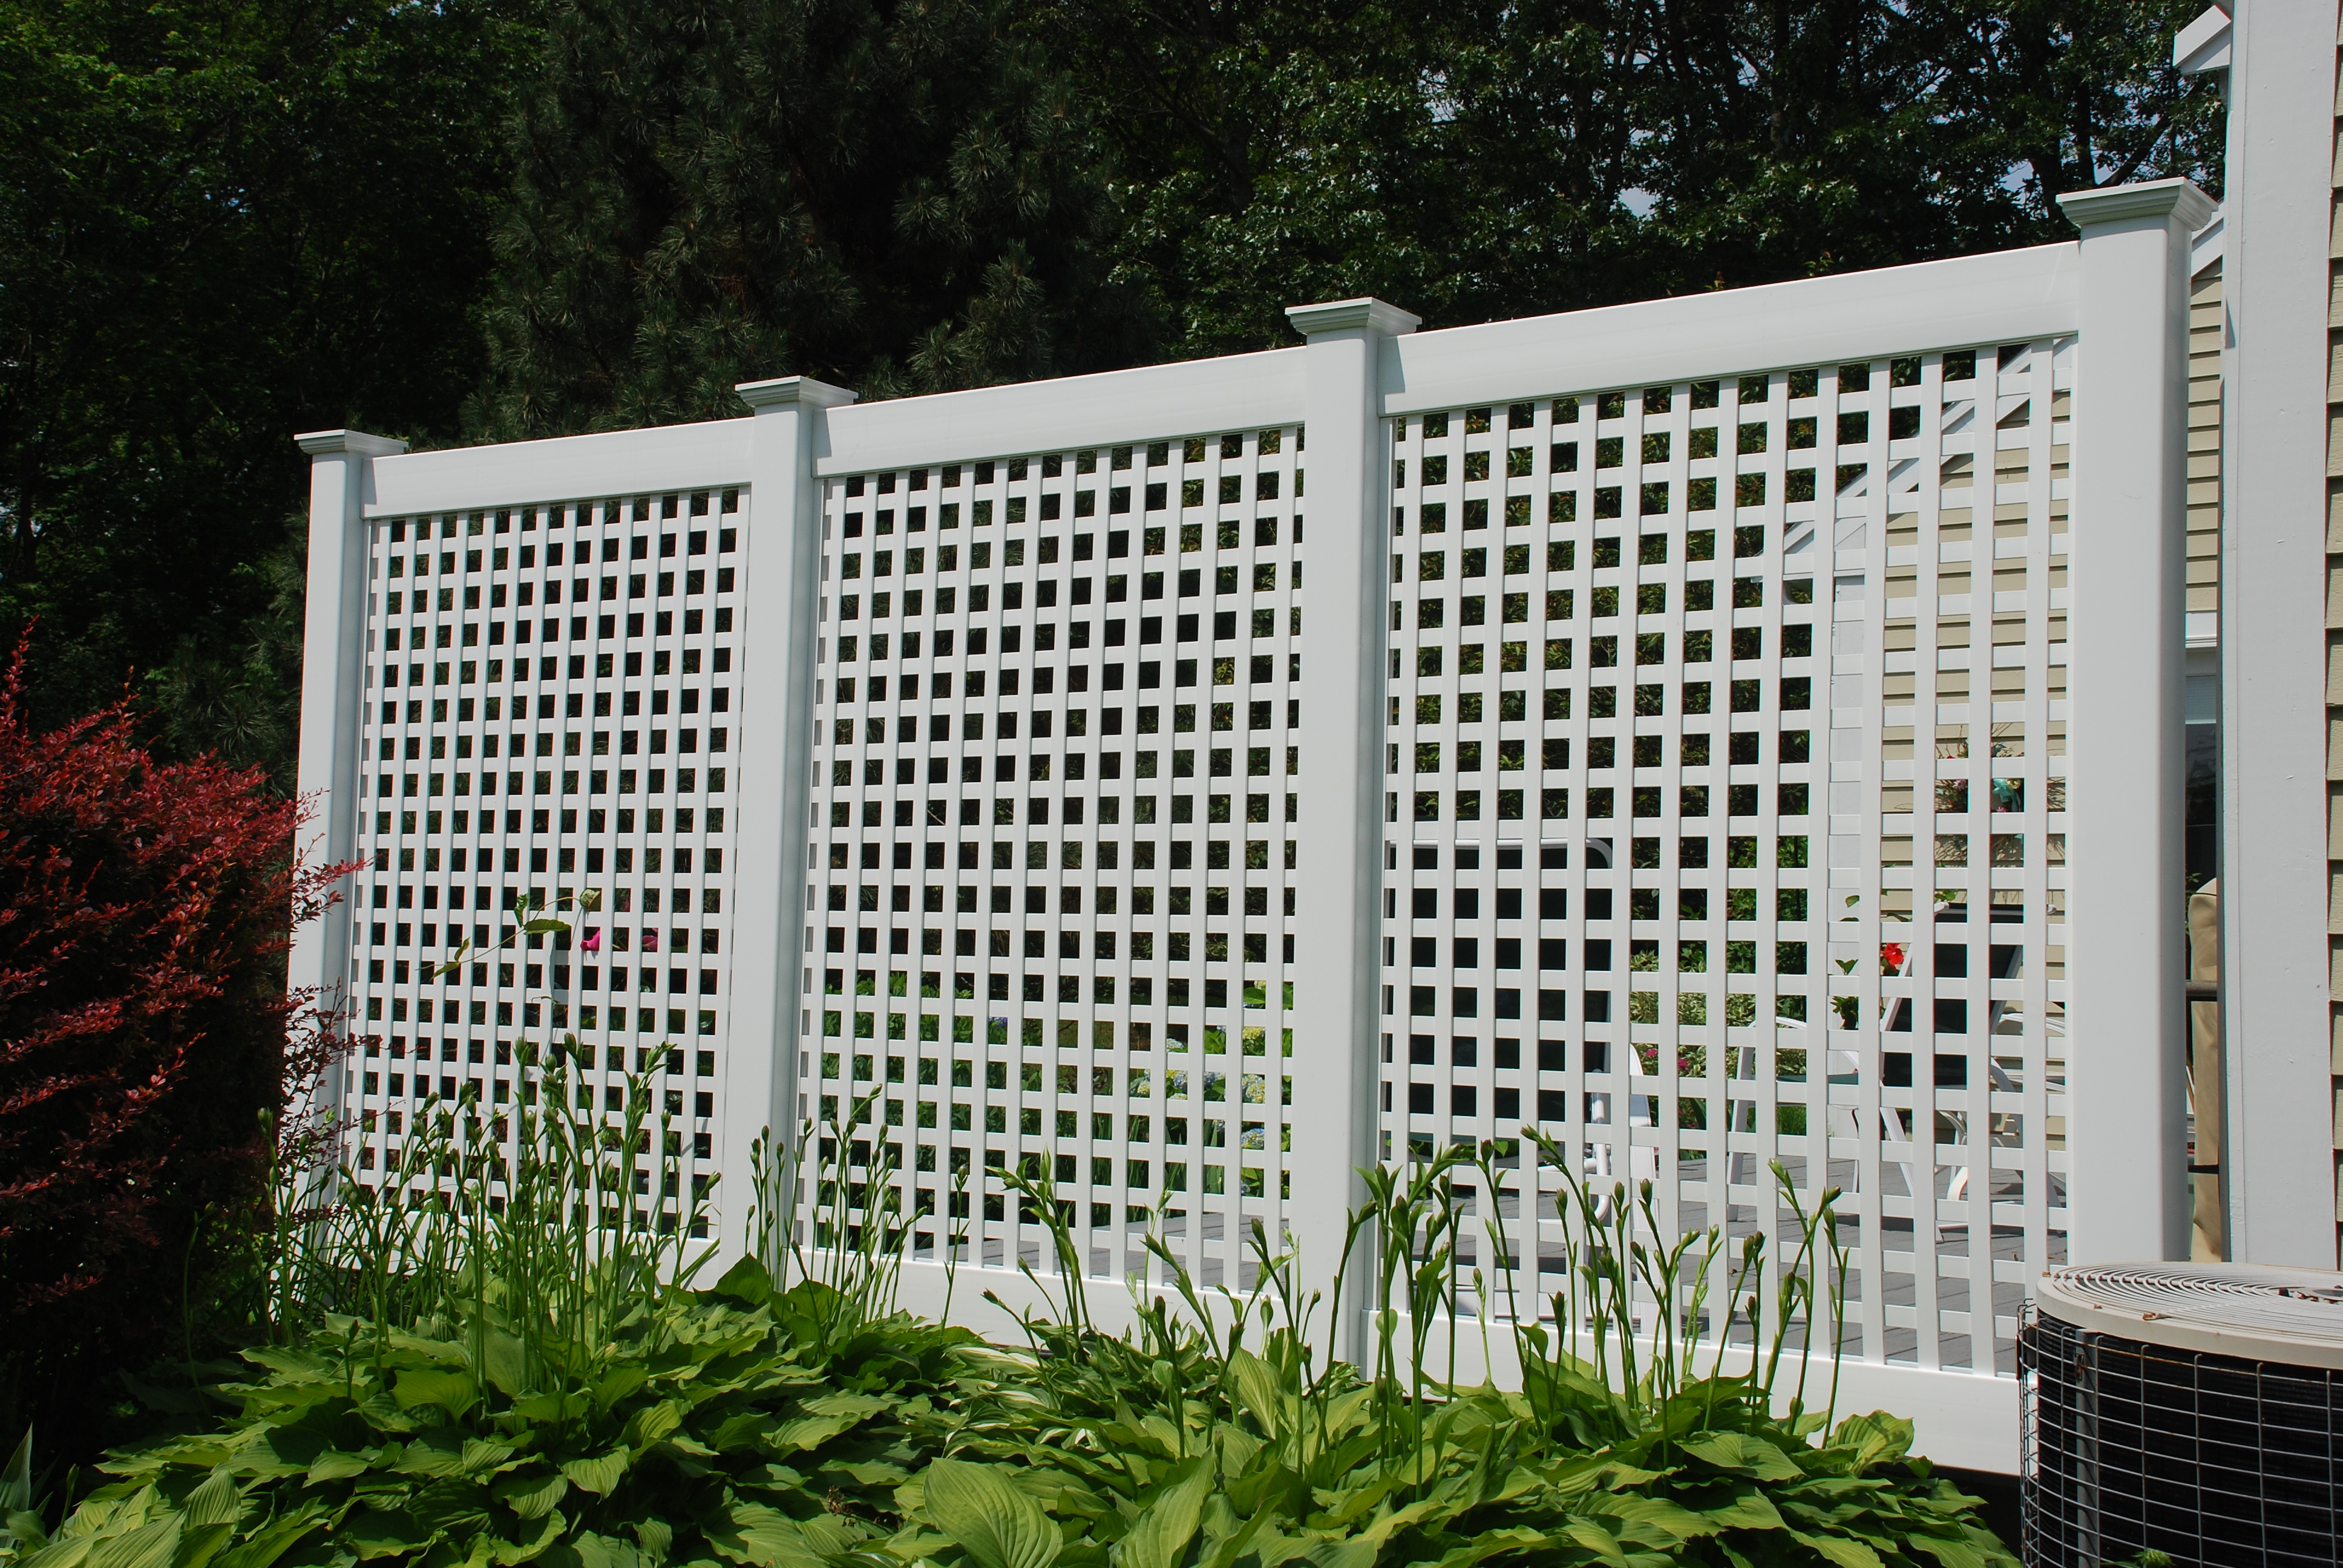 how to use permalatt lattice as privacy fencing RWTPABK